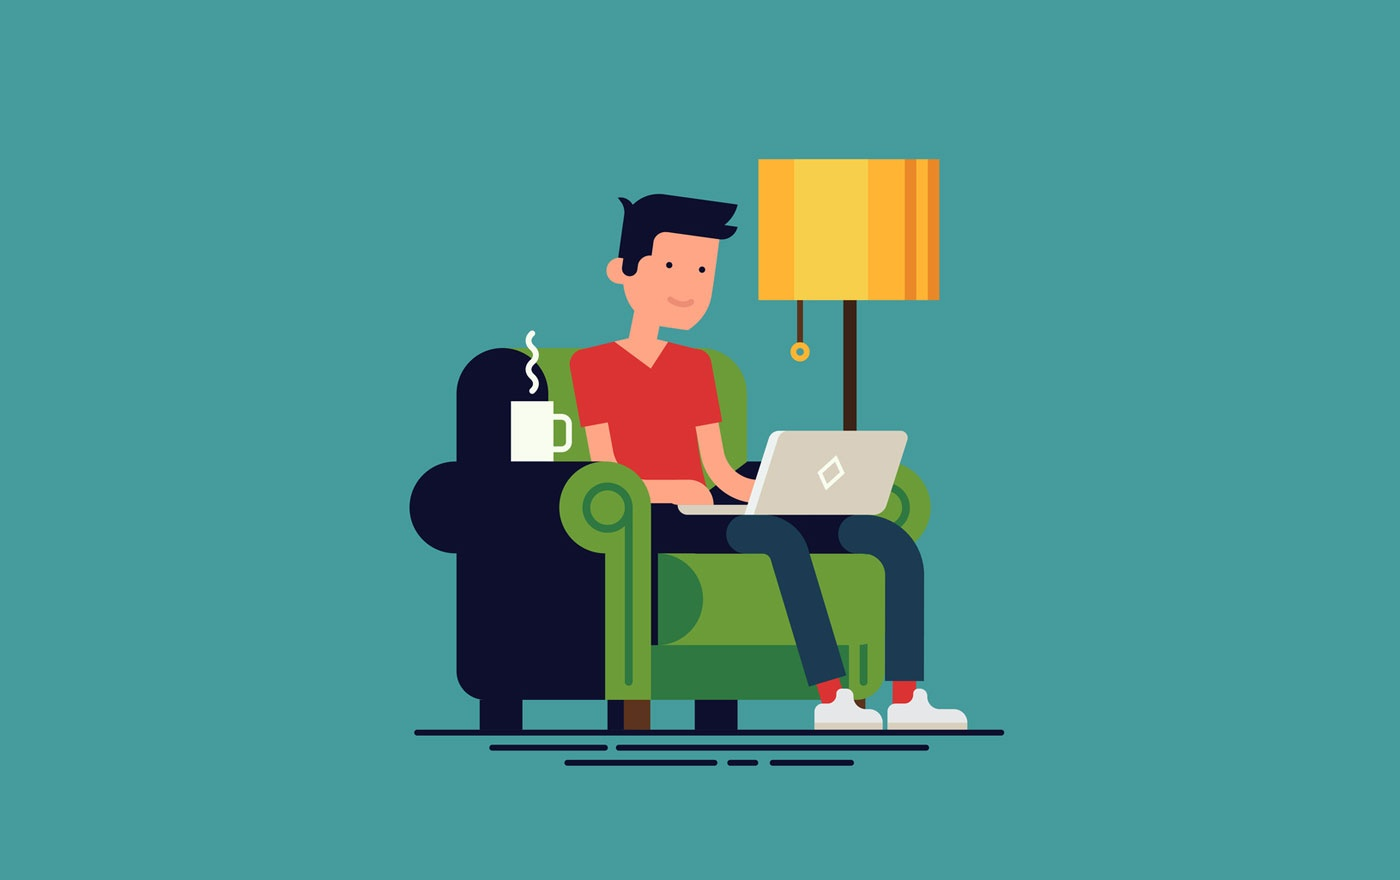 internet home business - عوامل تاثیرگذار مهم در شروع کسب و کارفردی